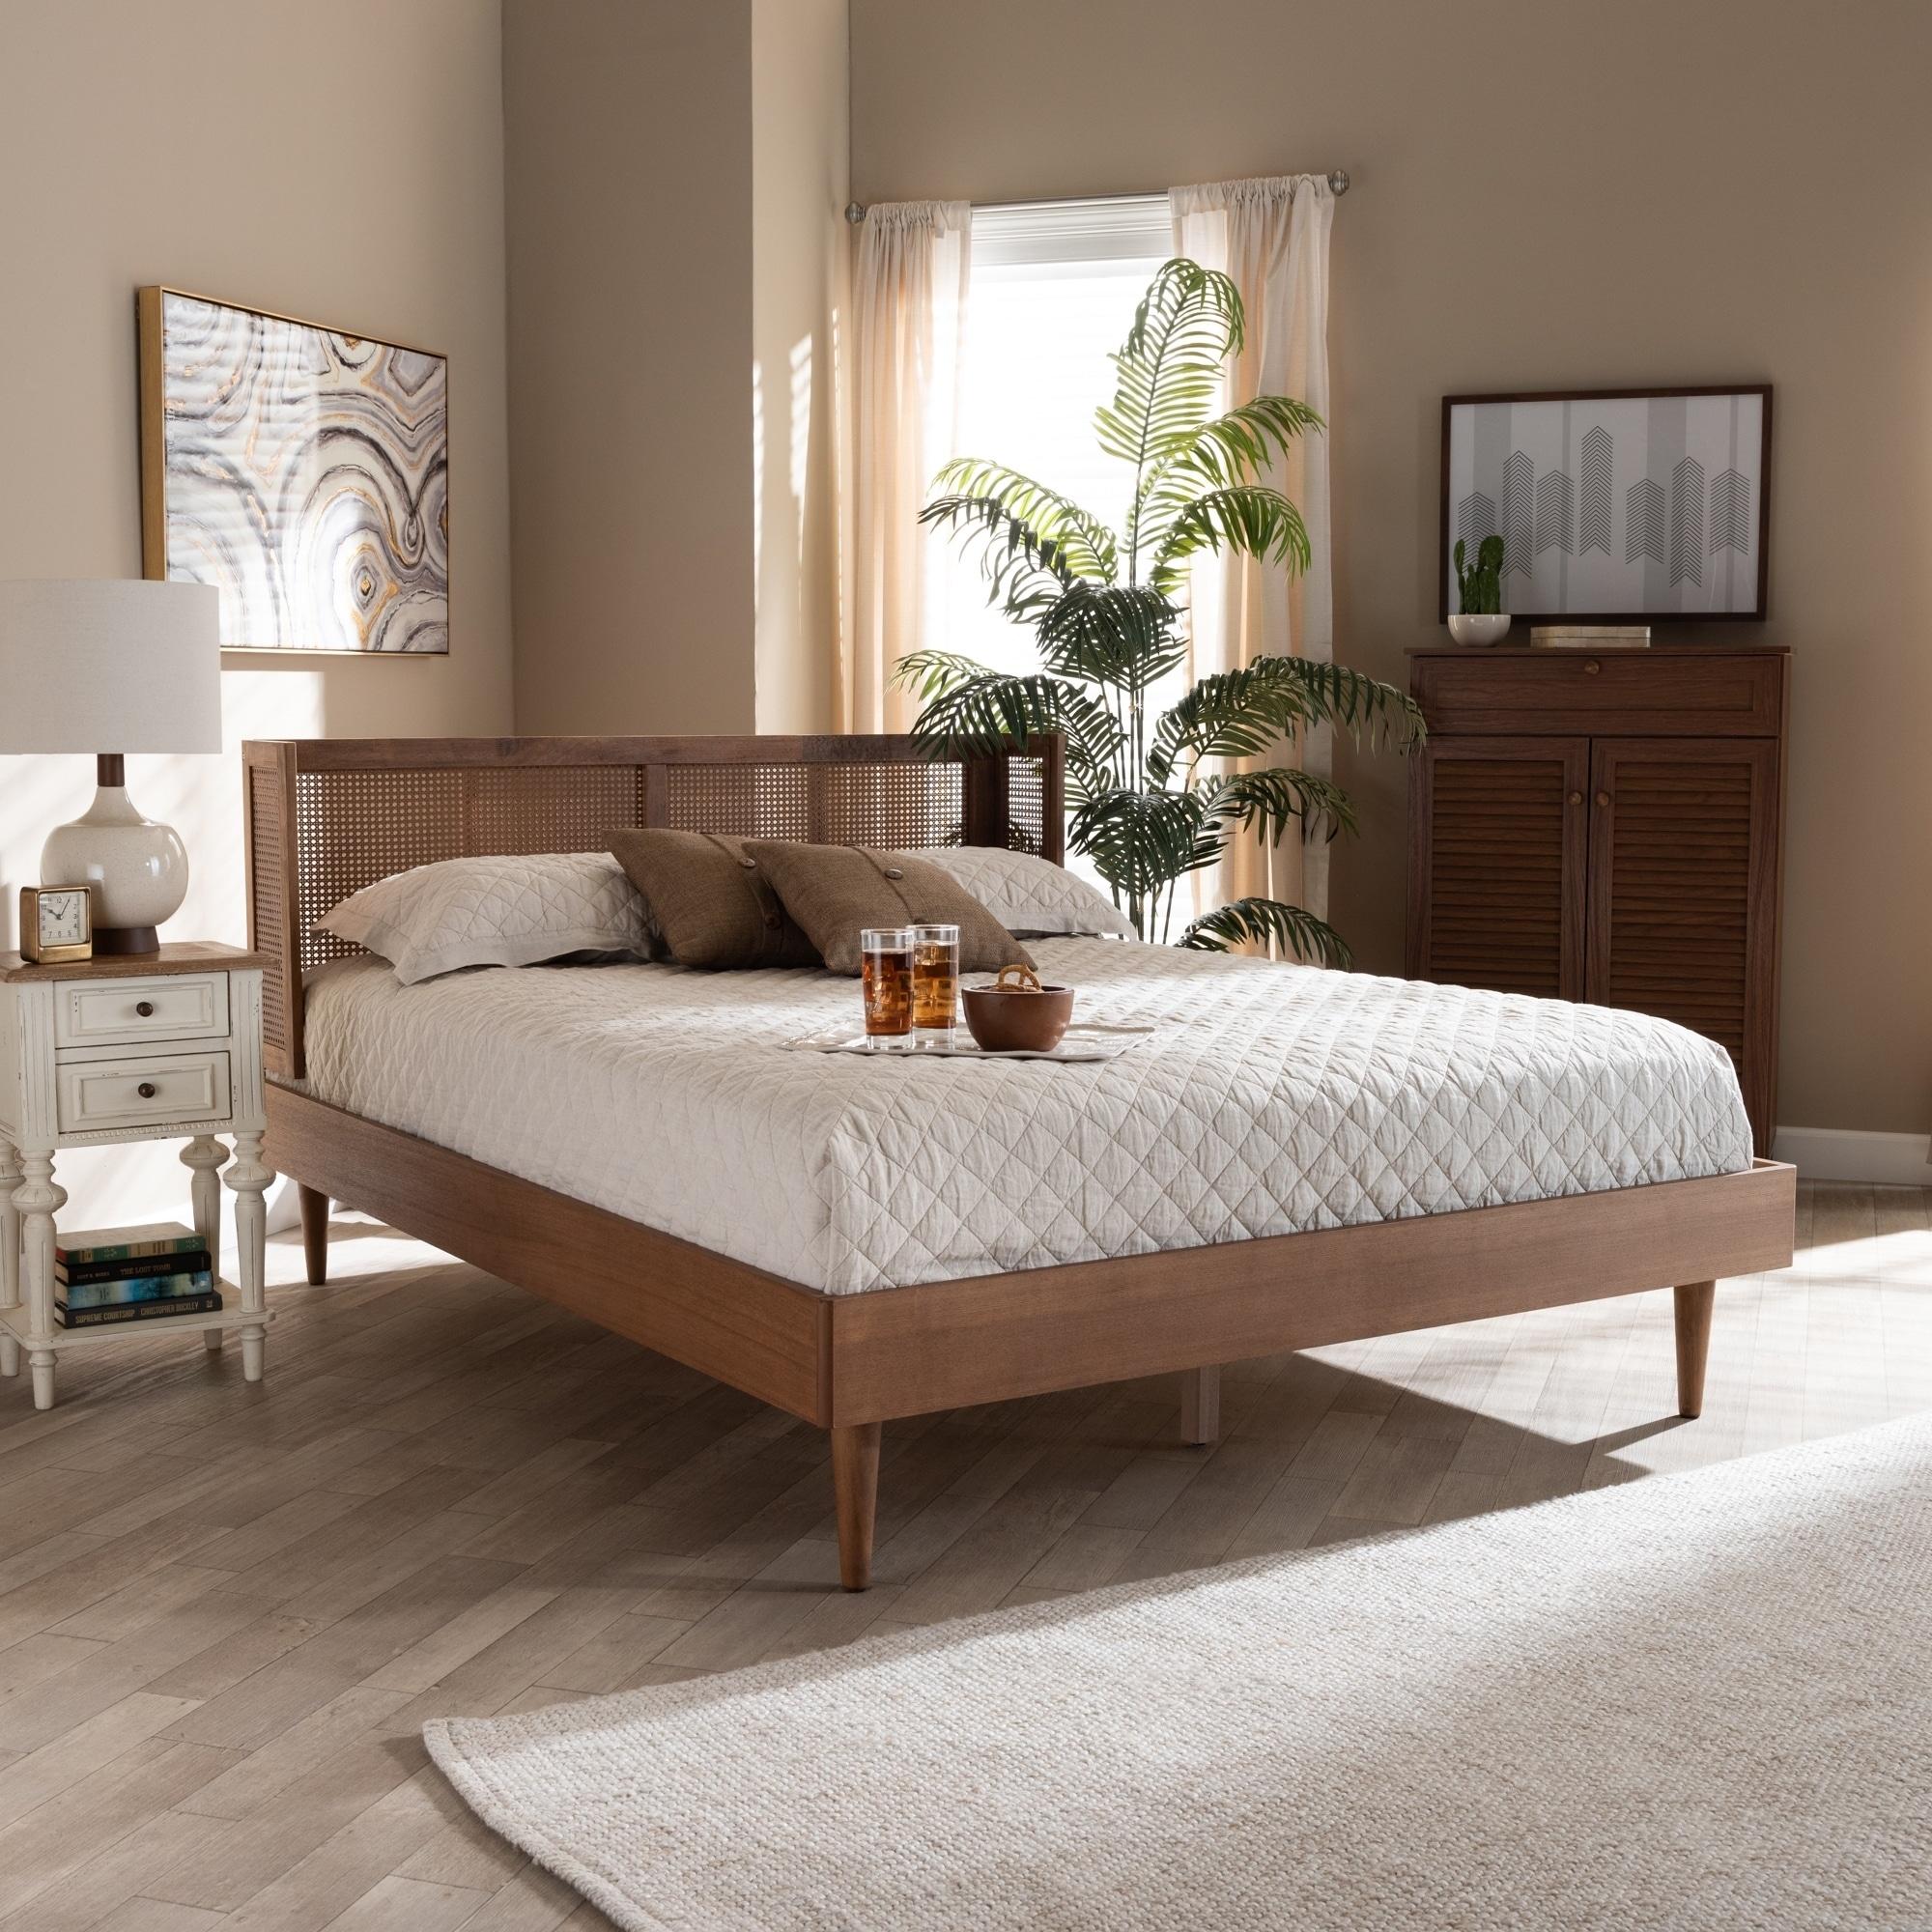 Gold Glass Dining Table, Shop Black Friday Deals On Carson Carrington Dagas Mid Century Modern Platform Bed Overstock 29065808 Full